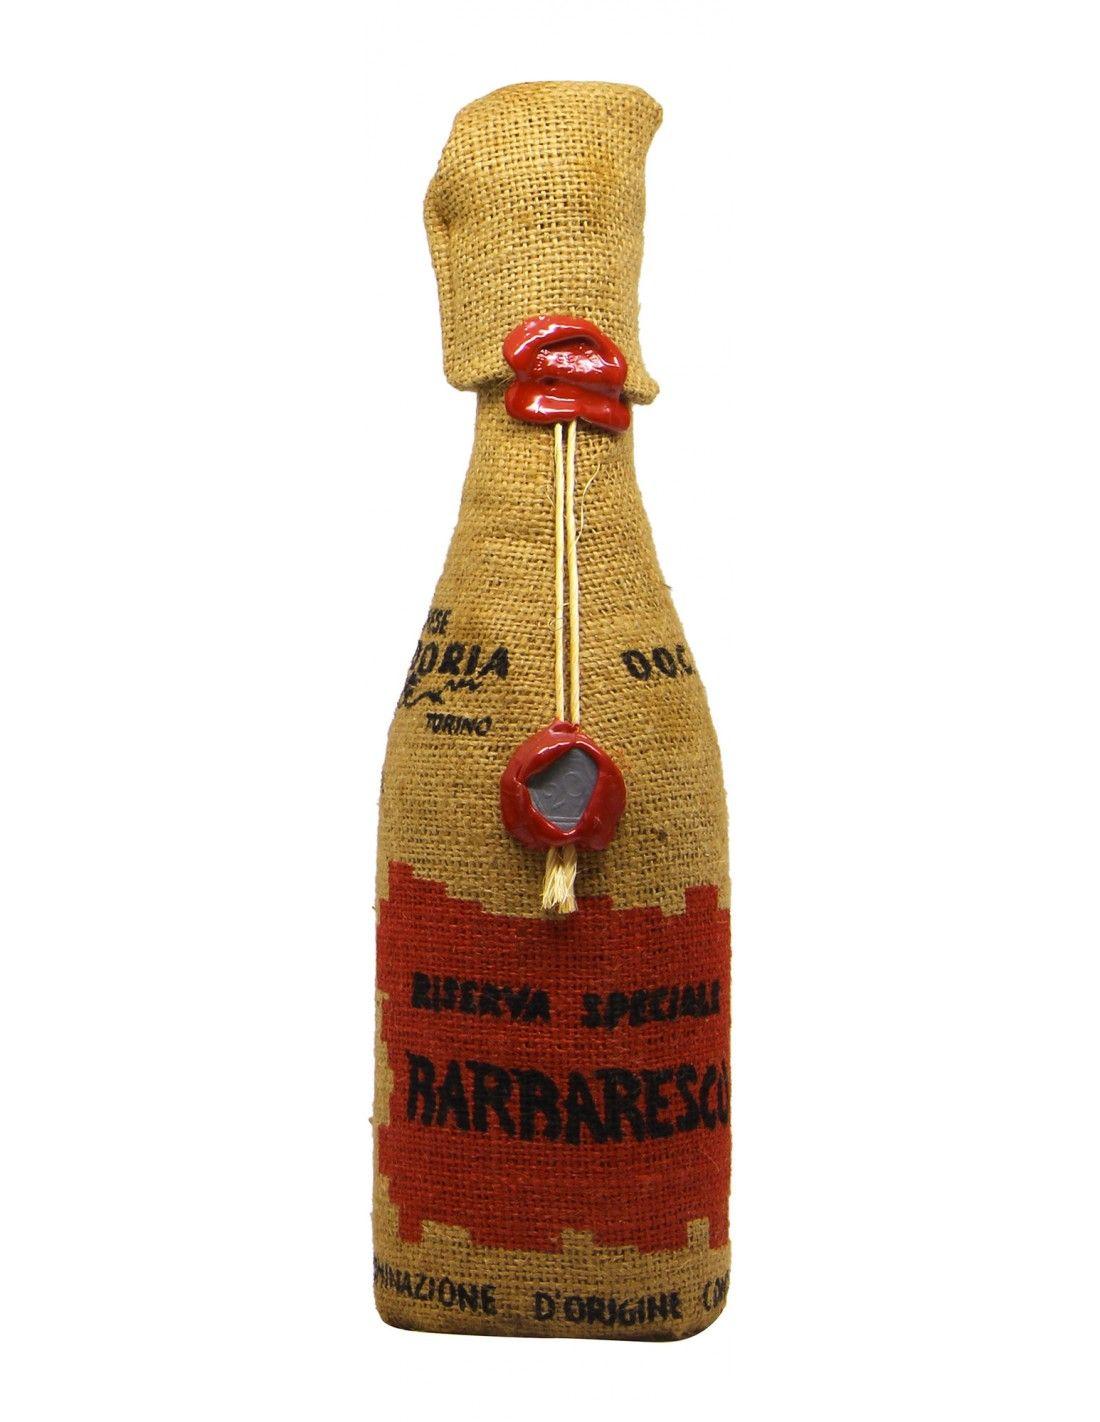 BARBARESCO RISERVA SPECIALE JUTA 1967 VILLADORIA Grandi Bottiglie